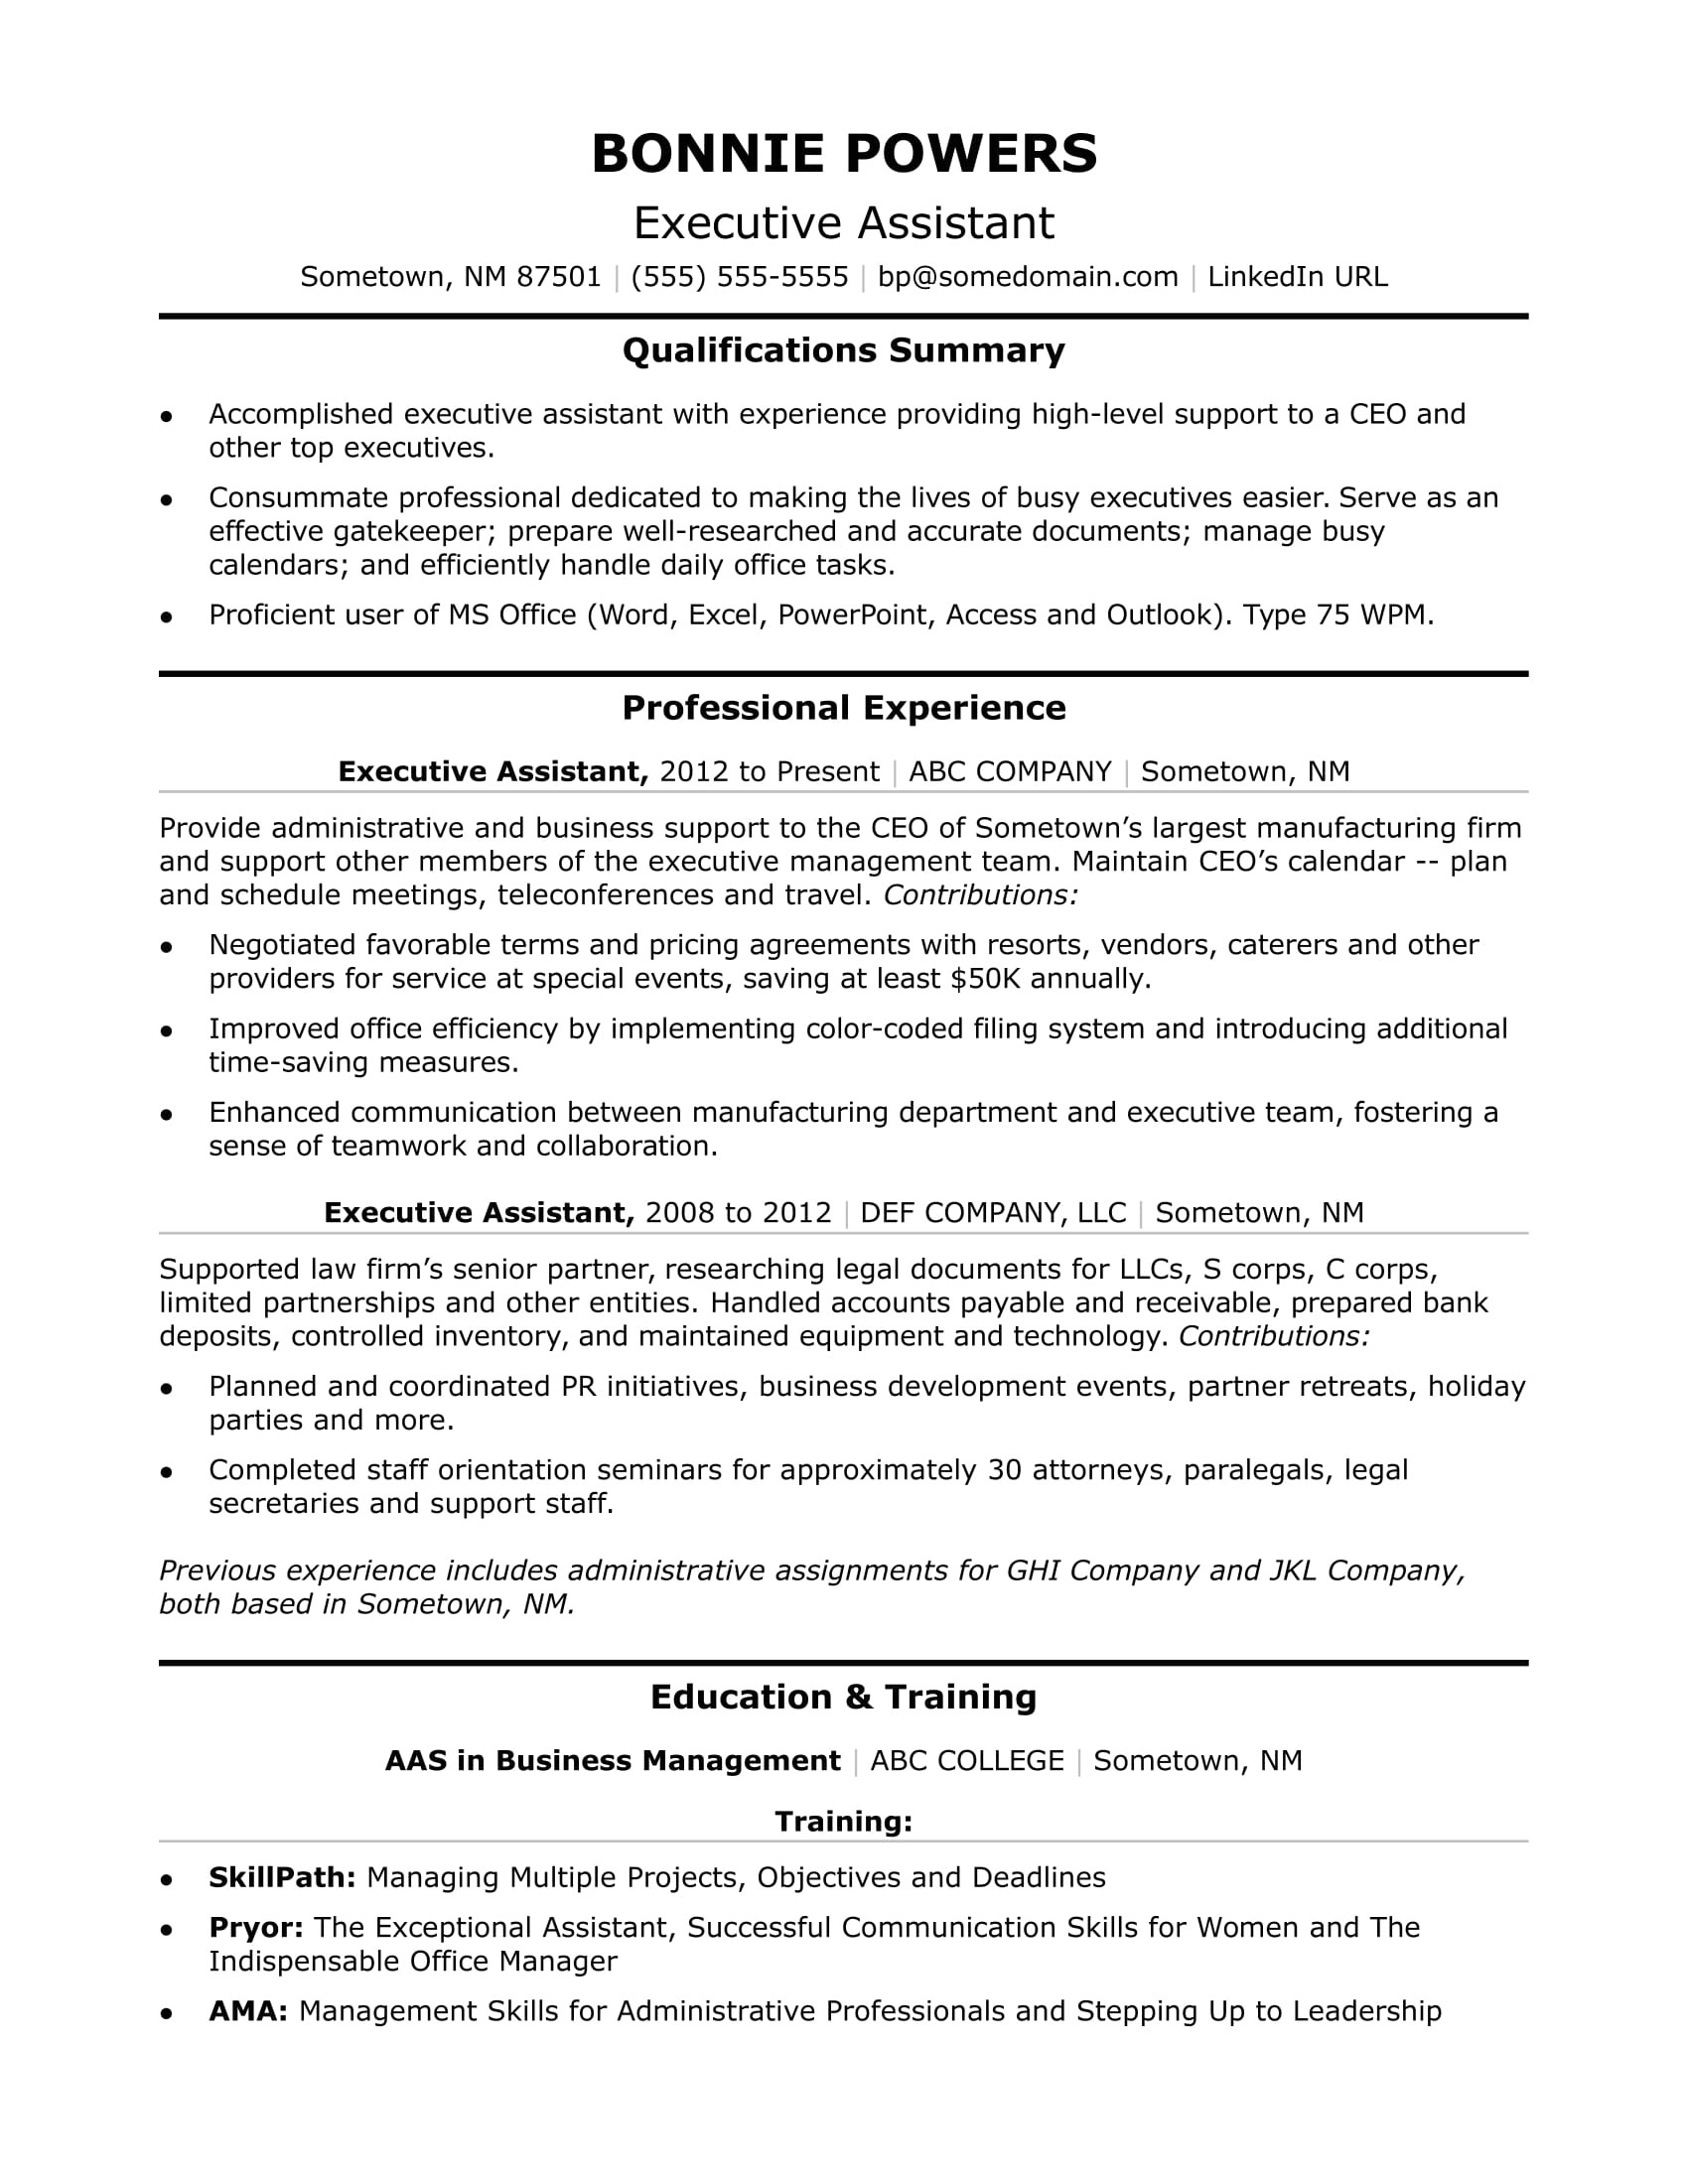 Samples Of Resumes for Administrative assistant Positions Executive Administrative assistant Resume Sample Monster Com